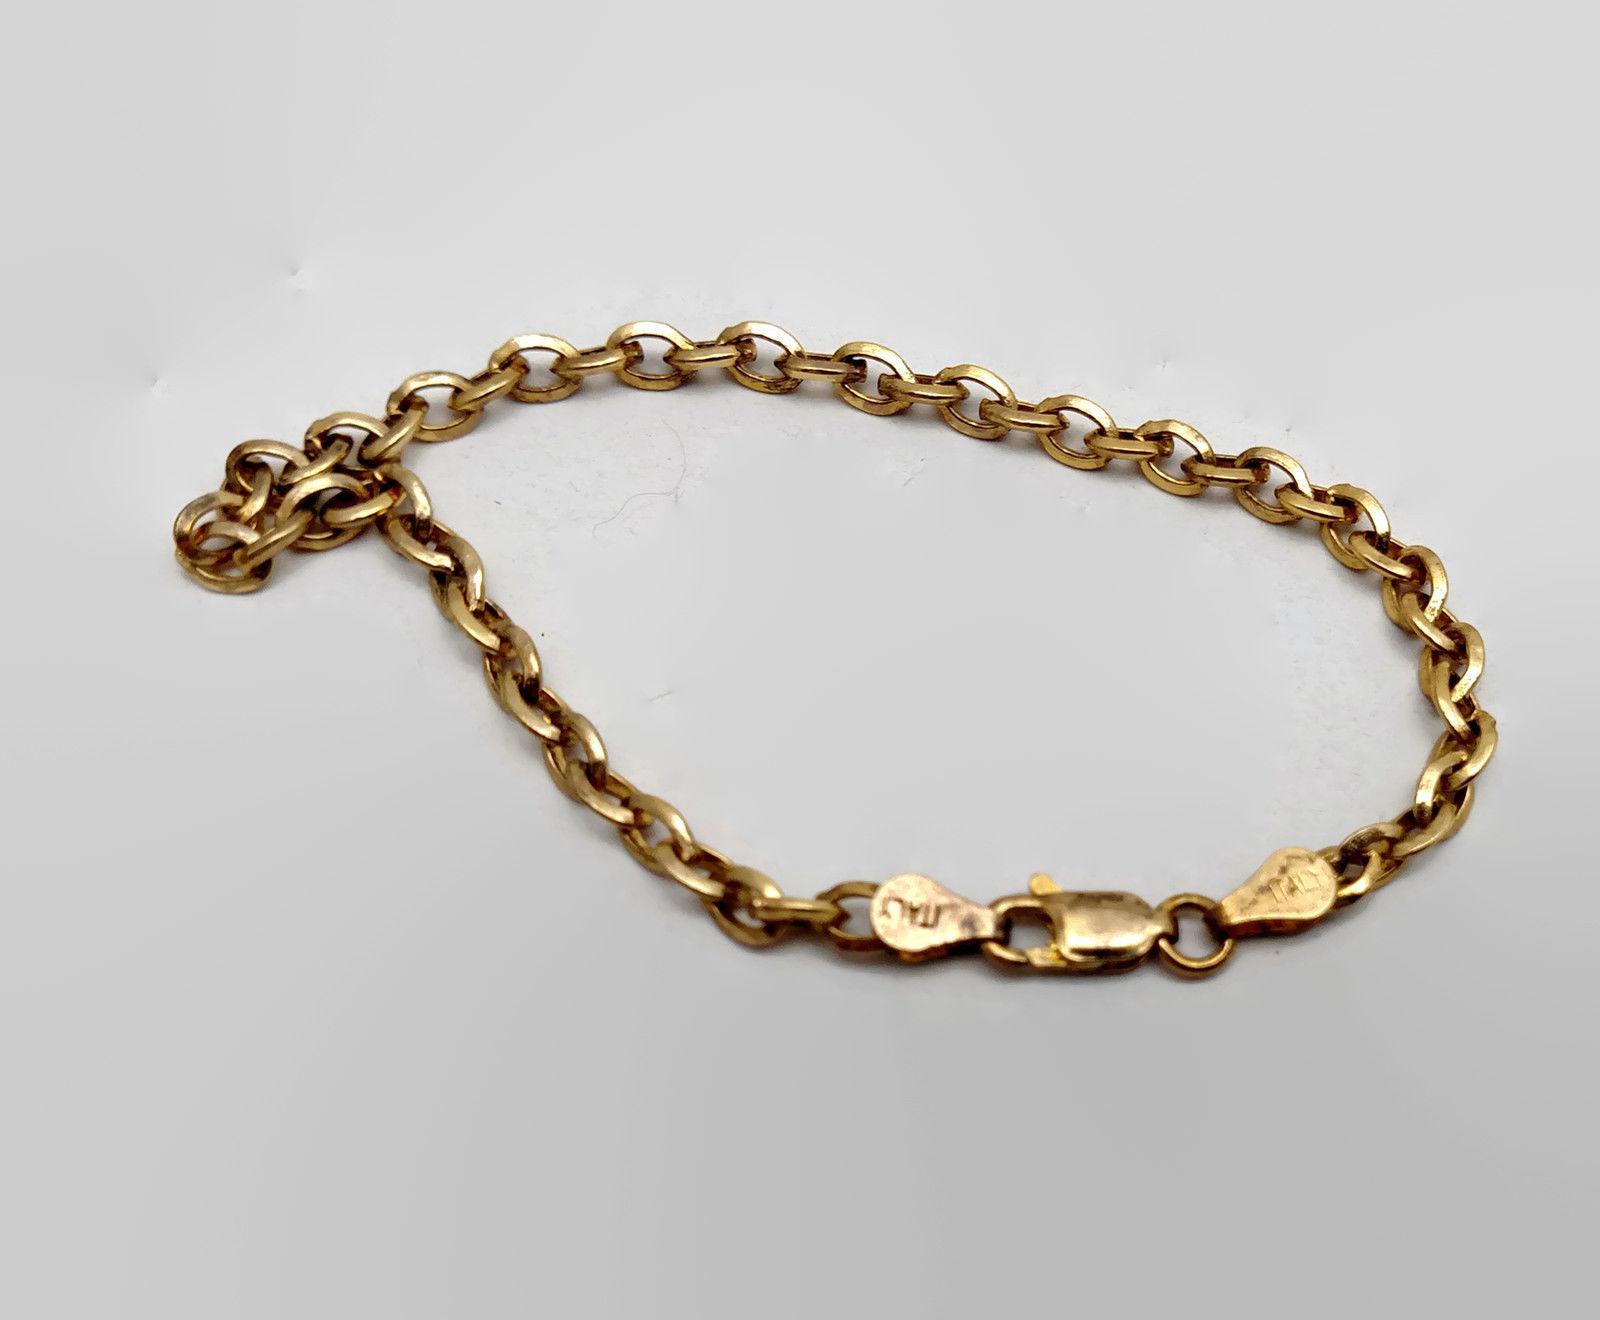 ITAOR Italian Gold Vermeil Sterling Silver Chain Bracelet